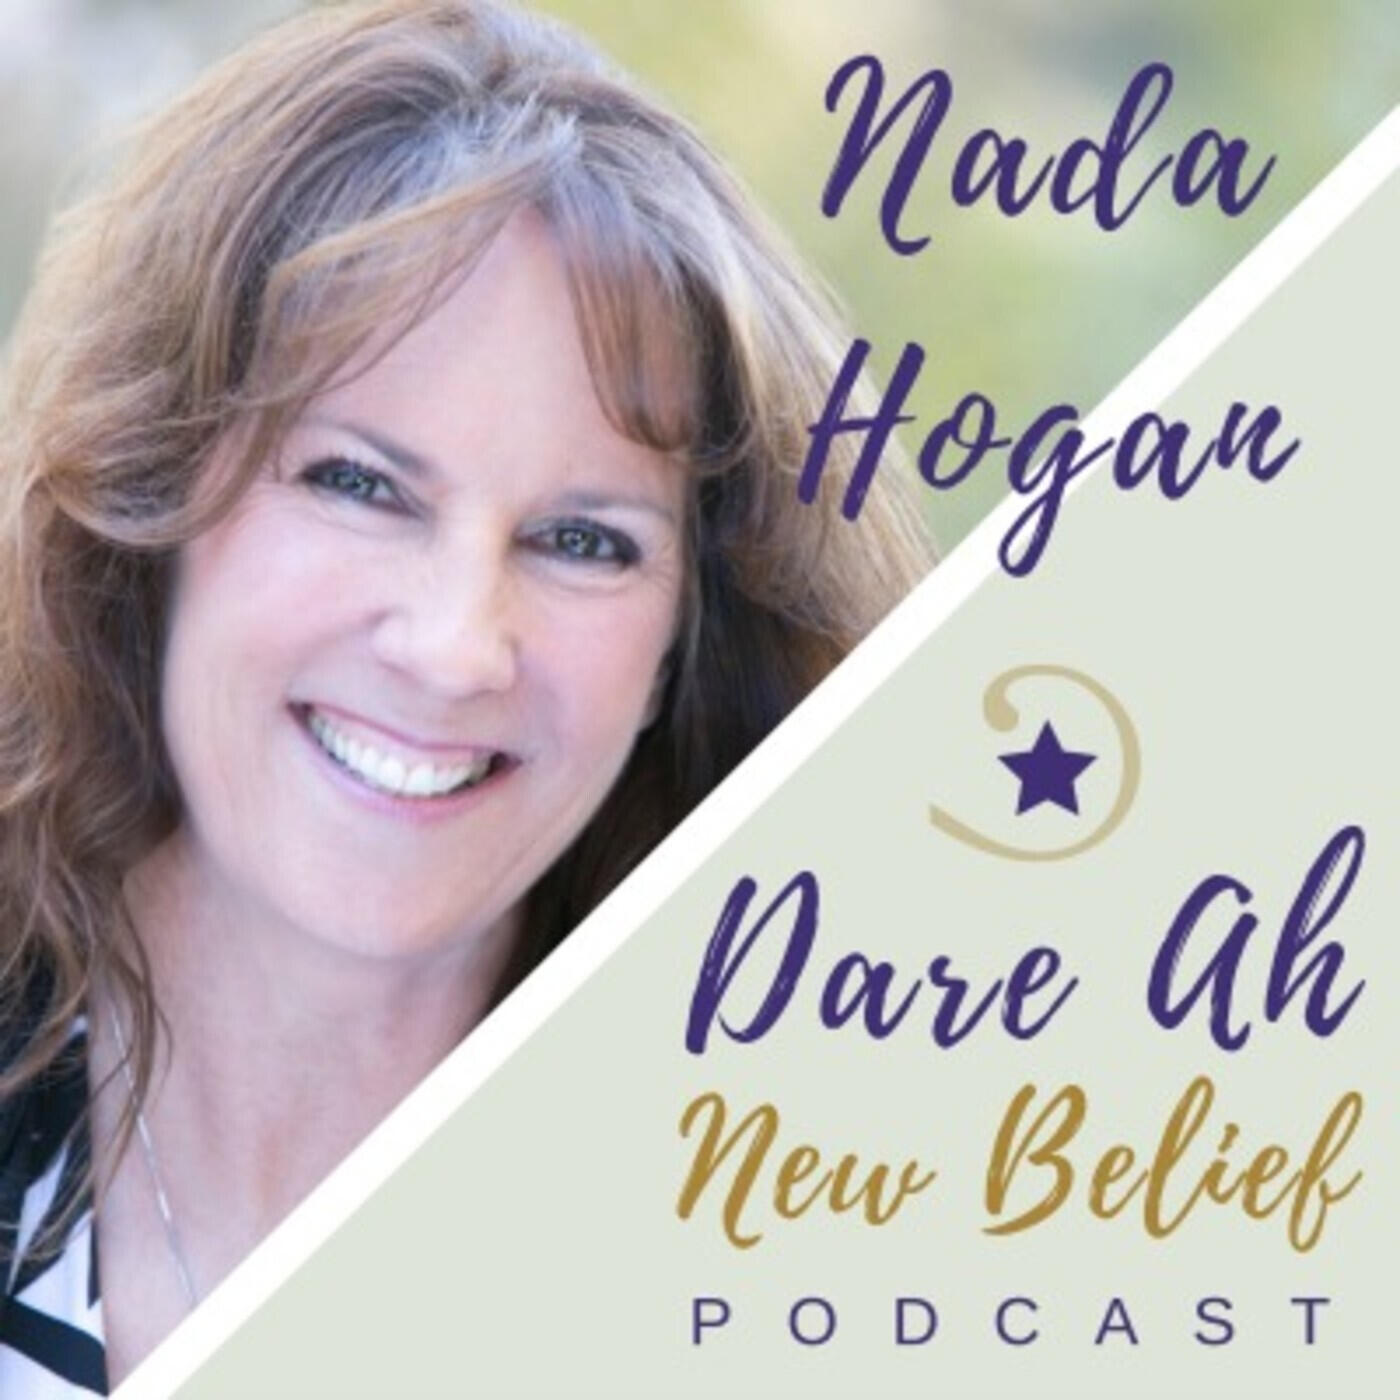 Dare Ah New Belief - Nada Hogan